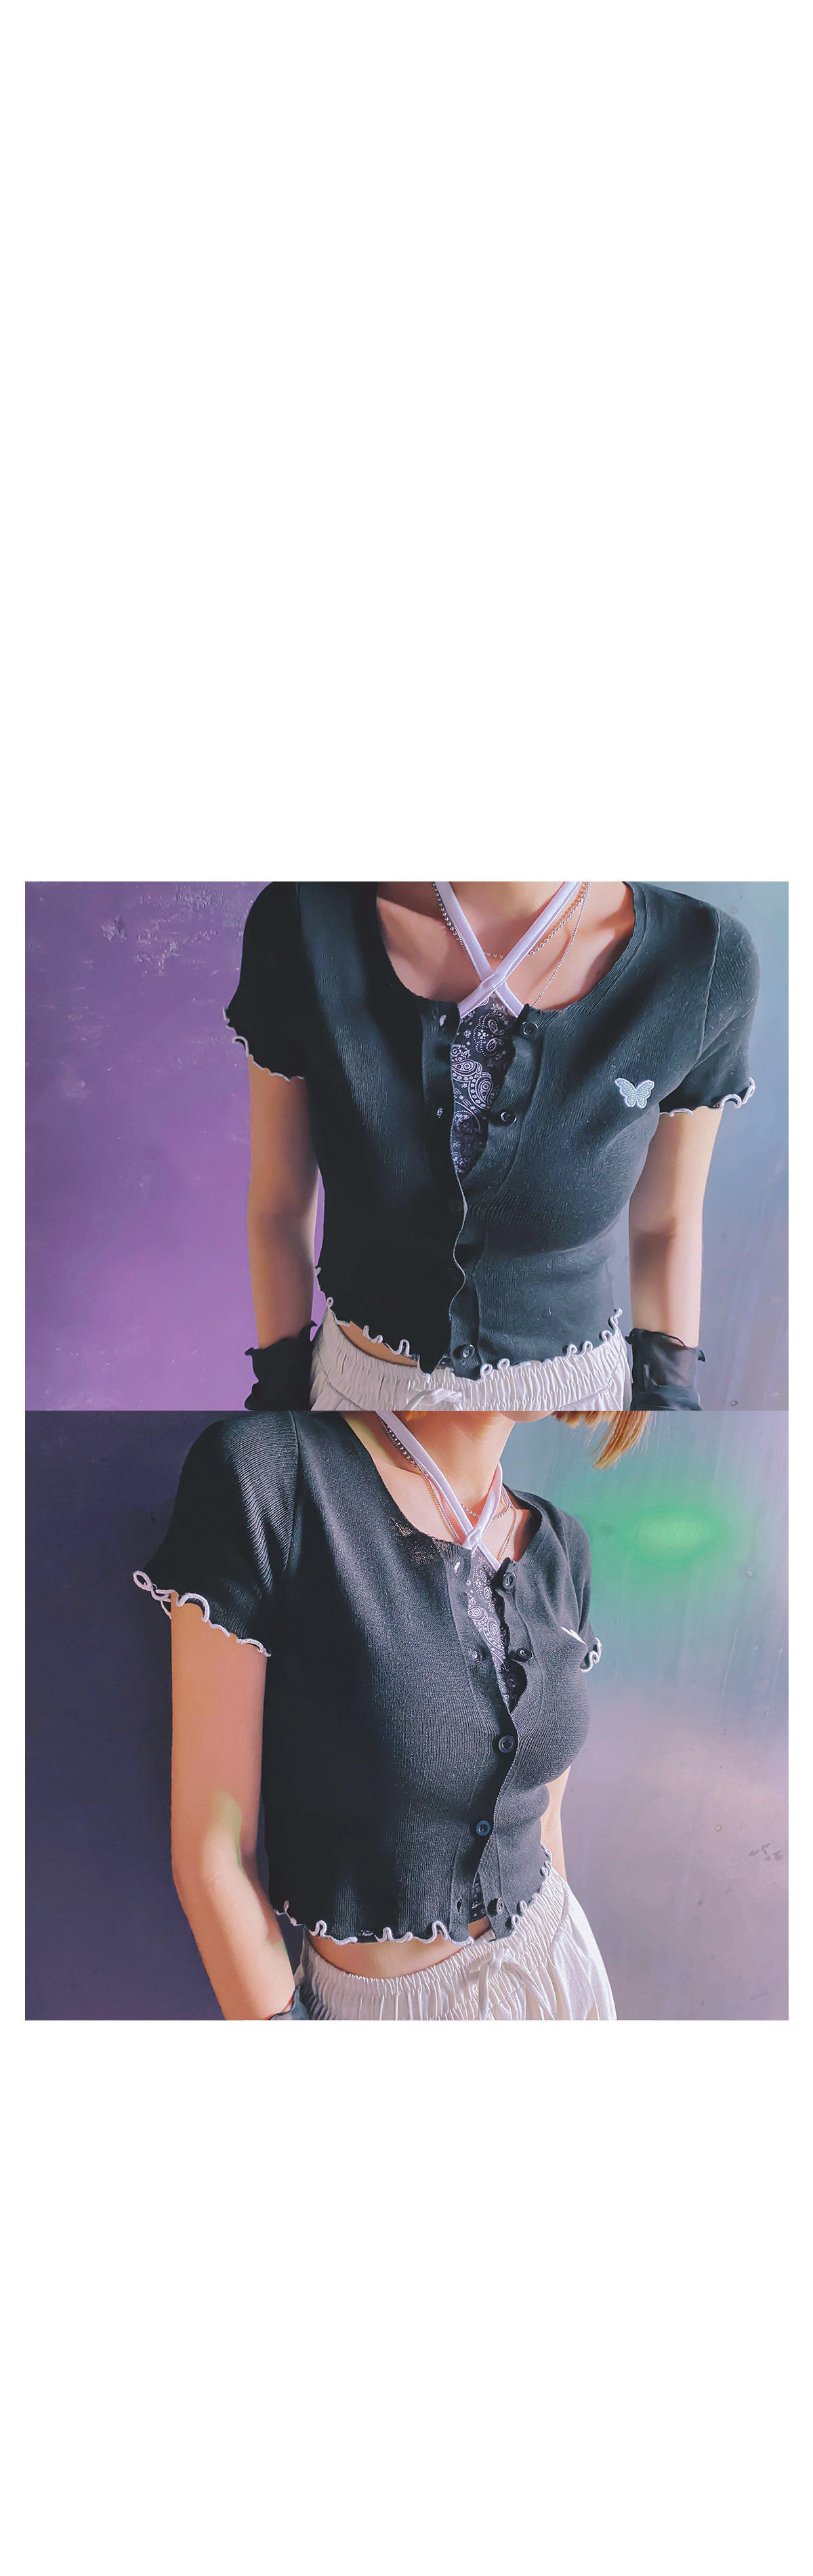 Butterfly Lona Knit Cardigan